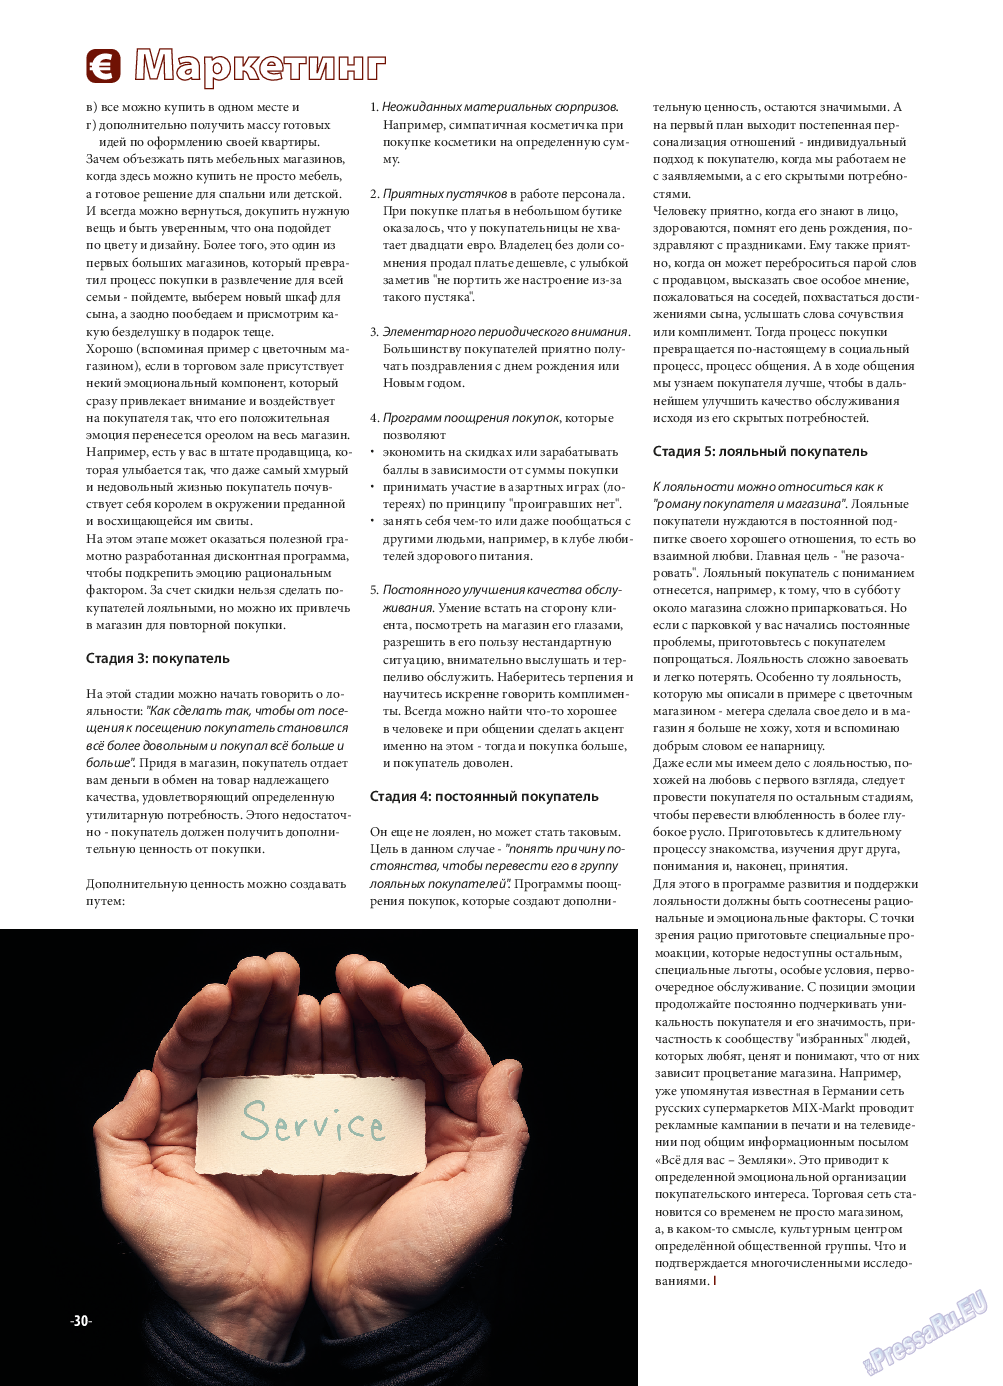 iDEAL (журнал). 2015 год, номер 8, стр. 30